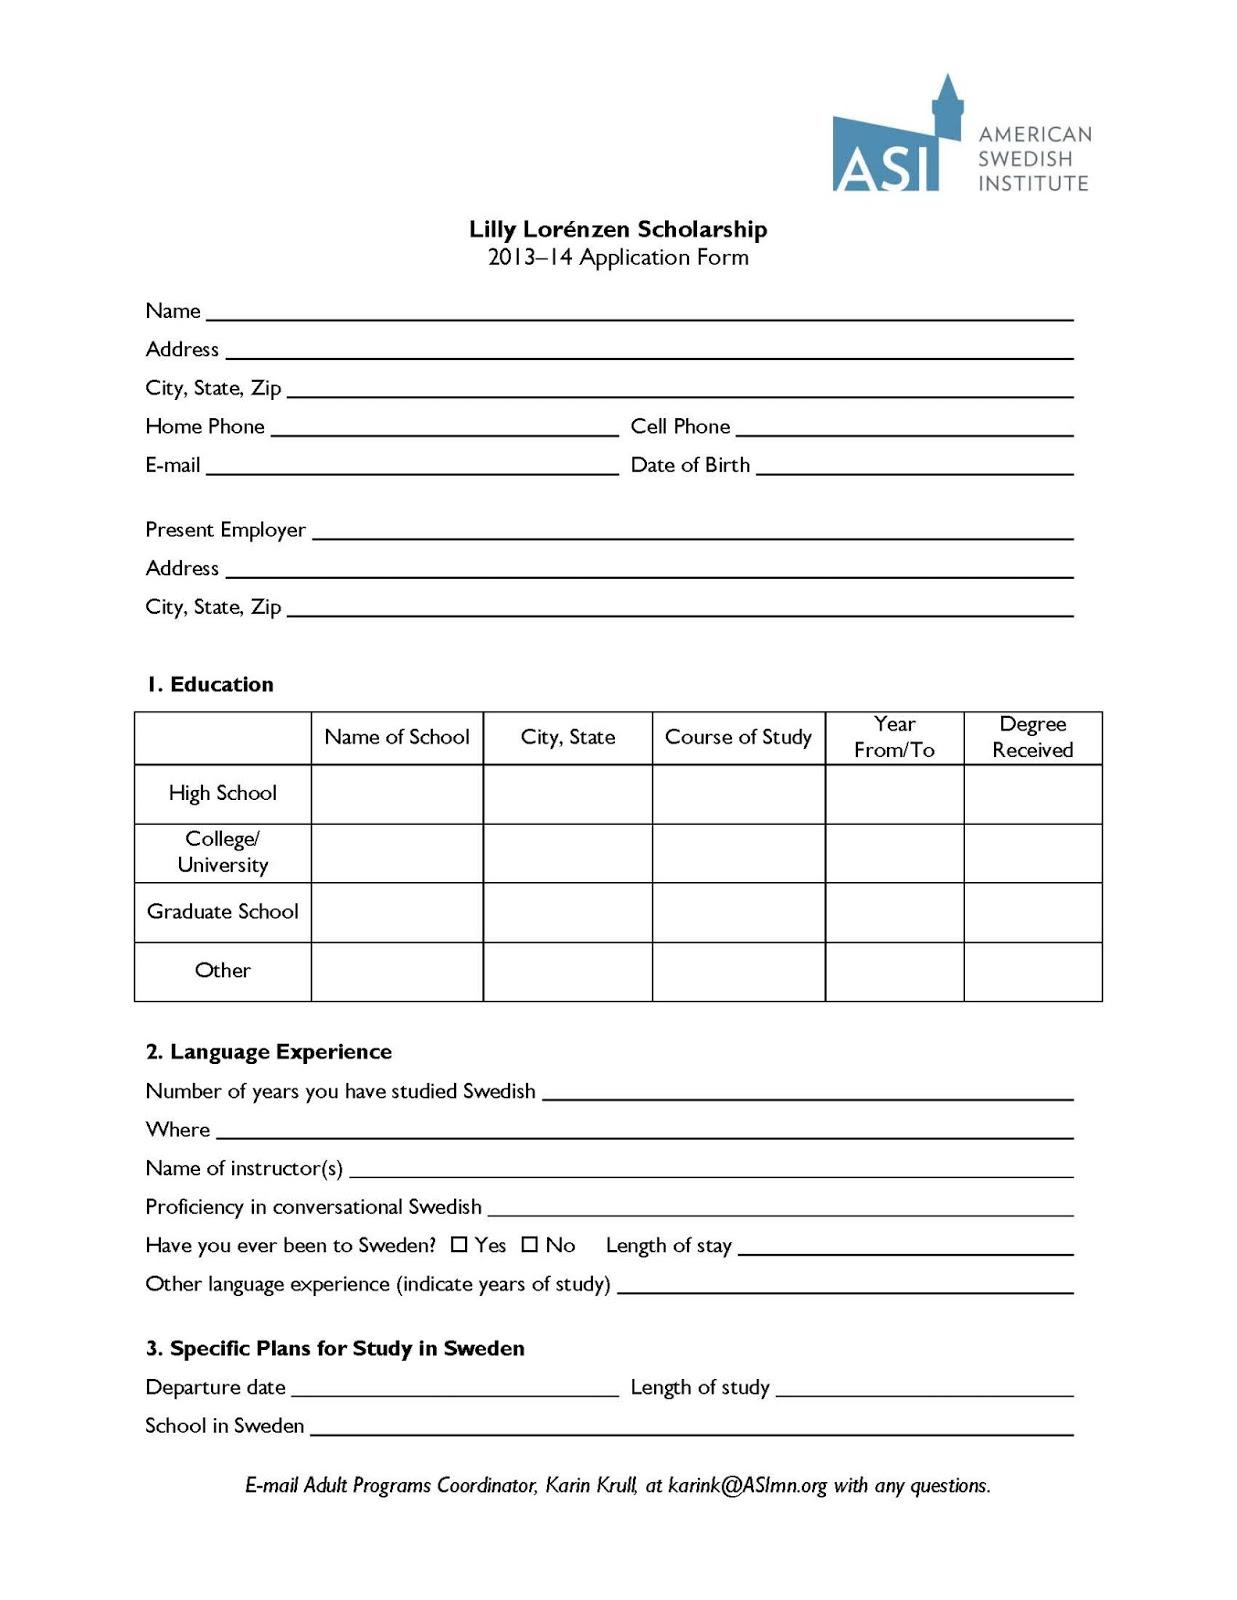 scholarship application no essay 91 121 113 106 scholarship application no essay